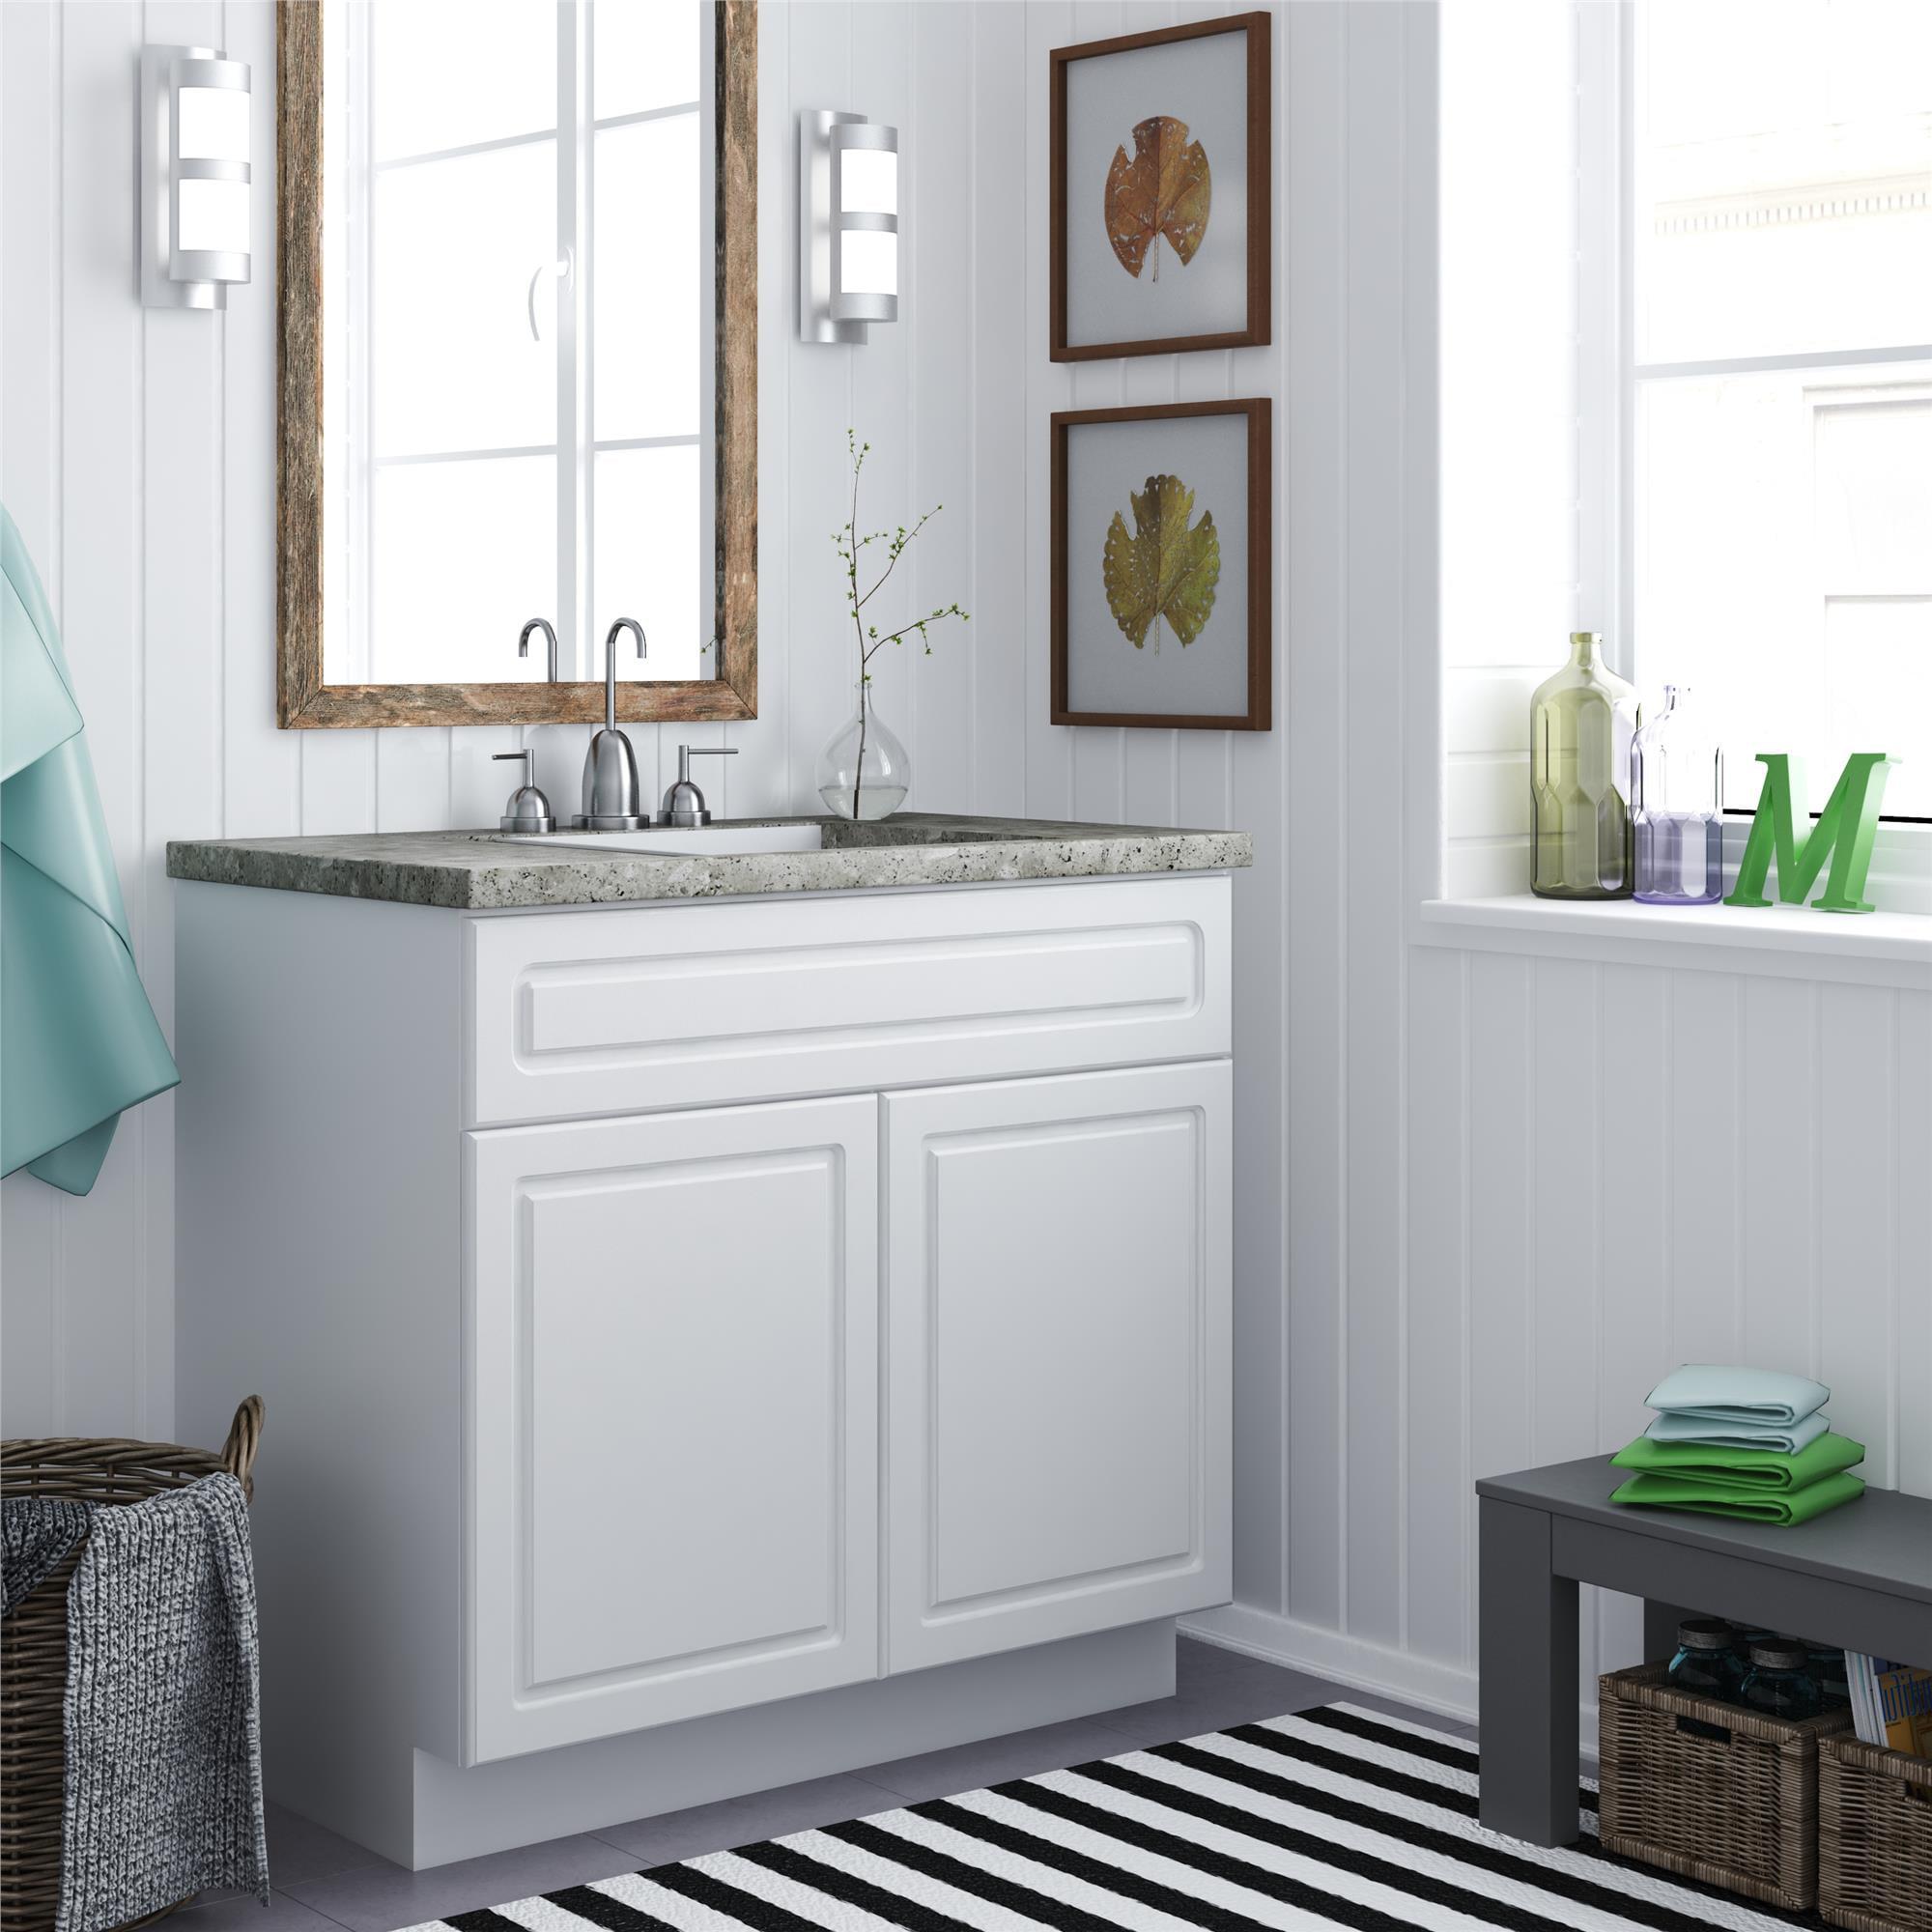 Heartland Cabinetry Keystone Bath Vanity Cabinet-Size:36\